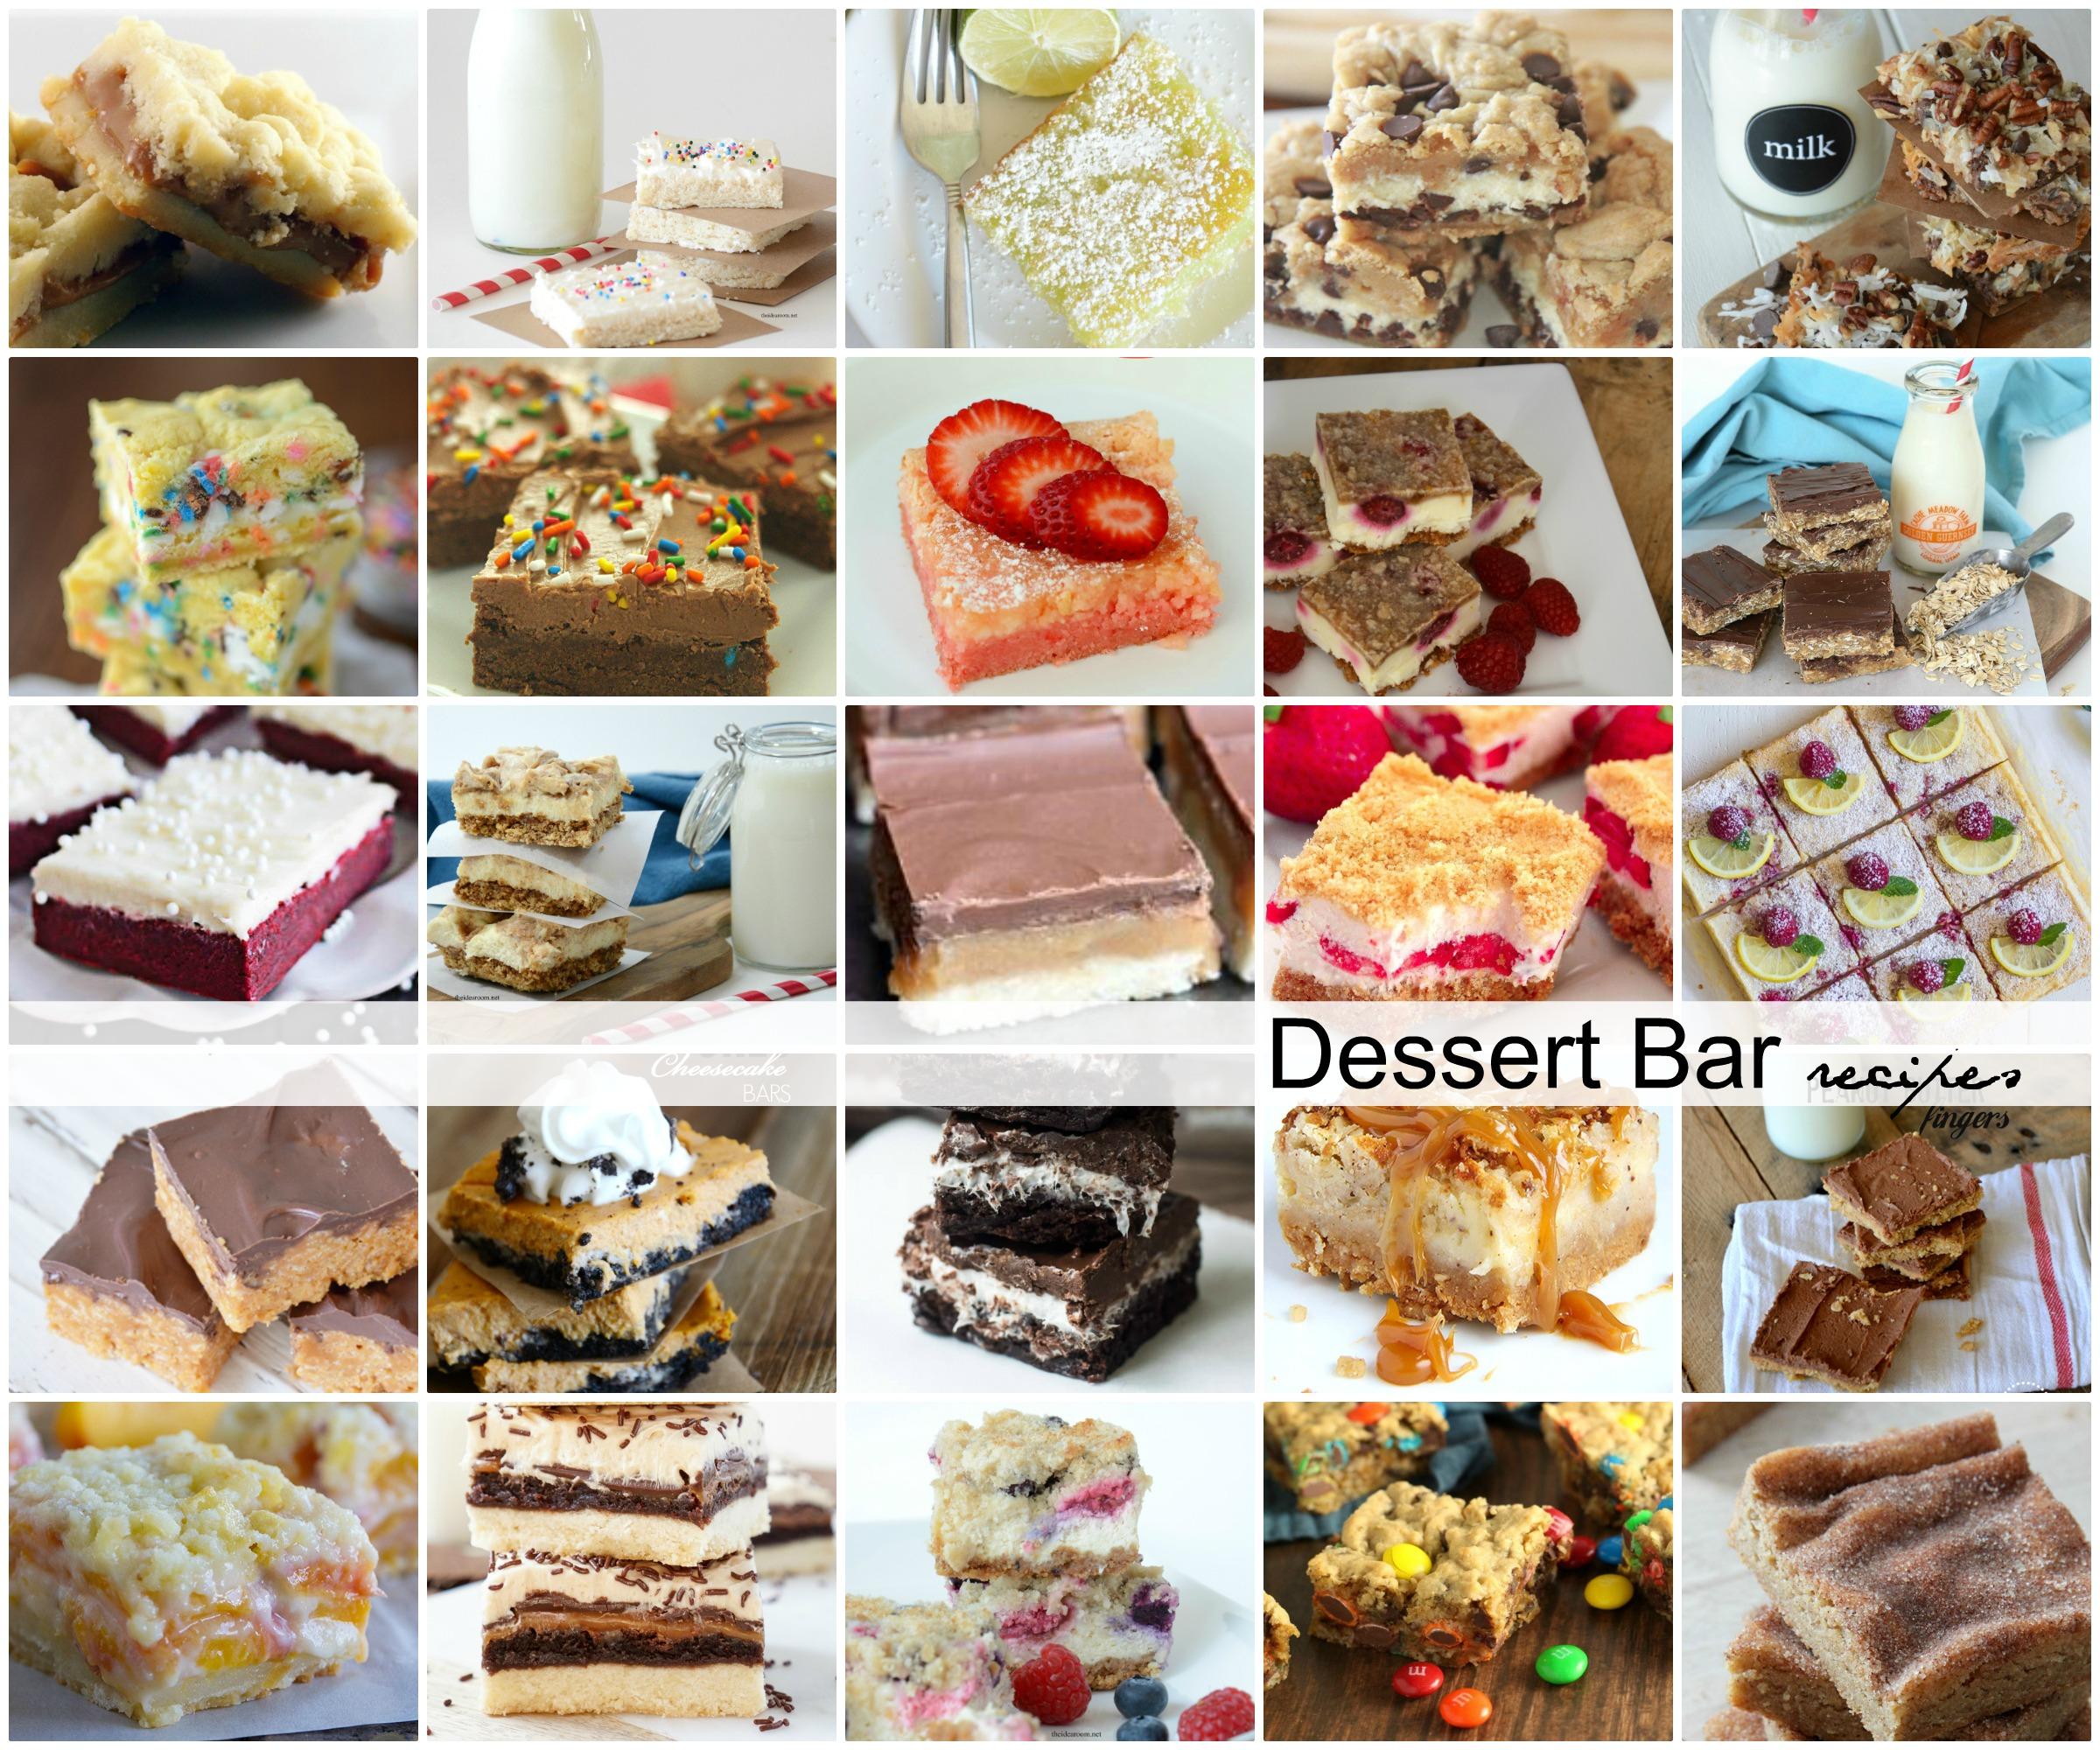 Dessert-Bar-Recipes-1